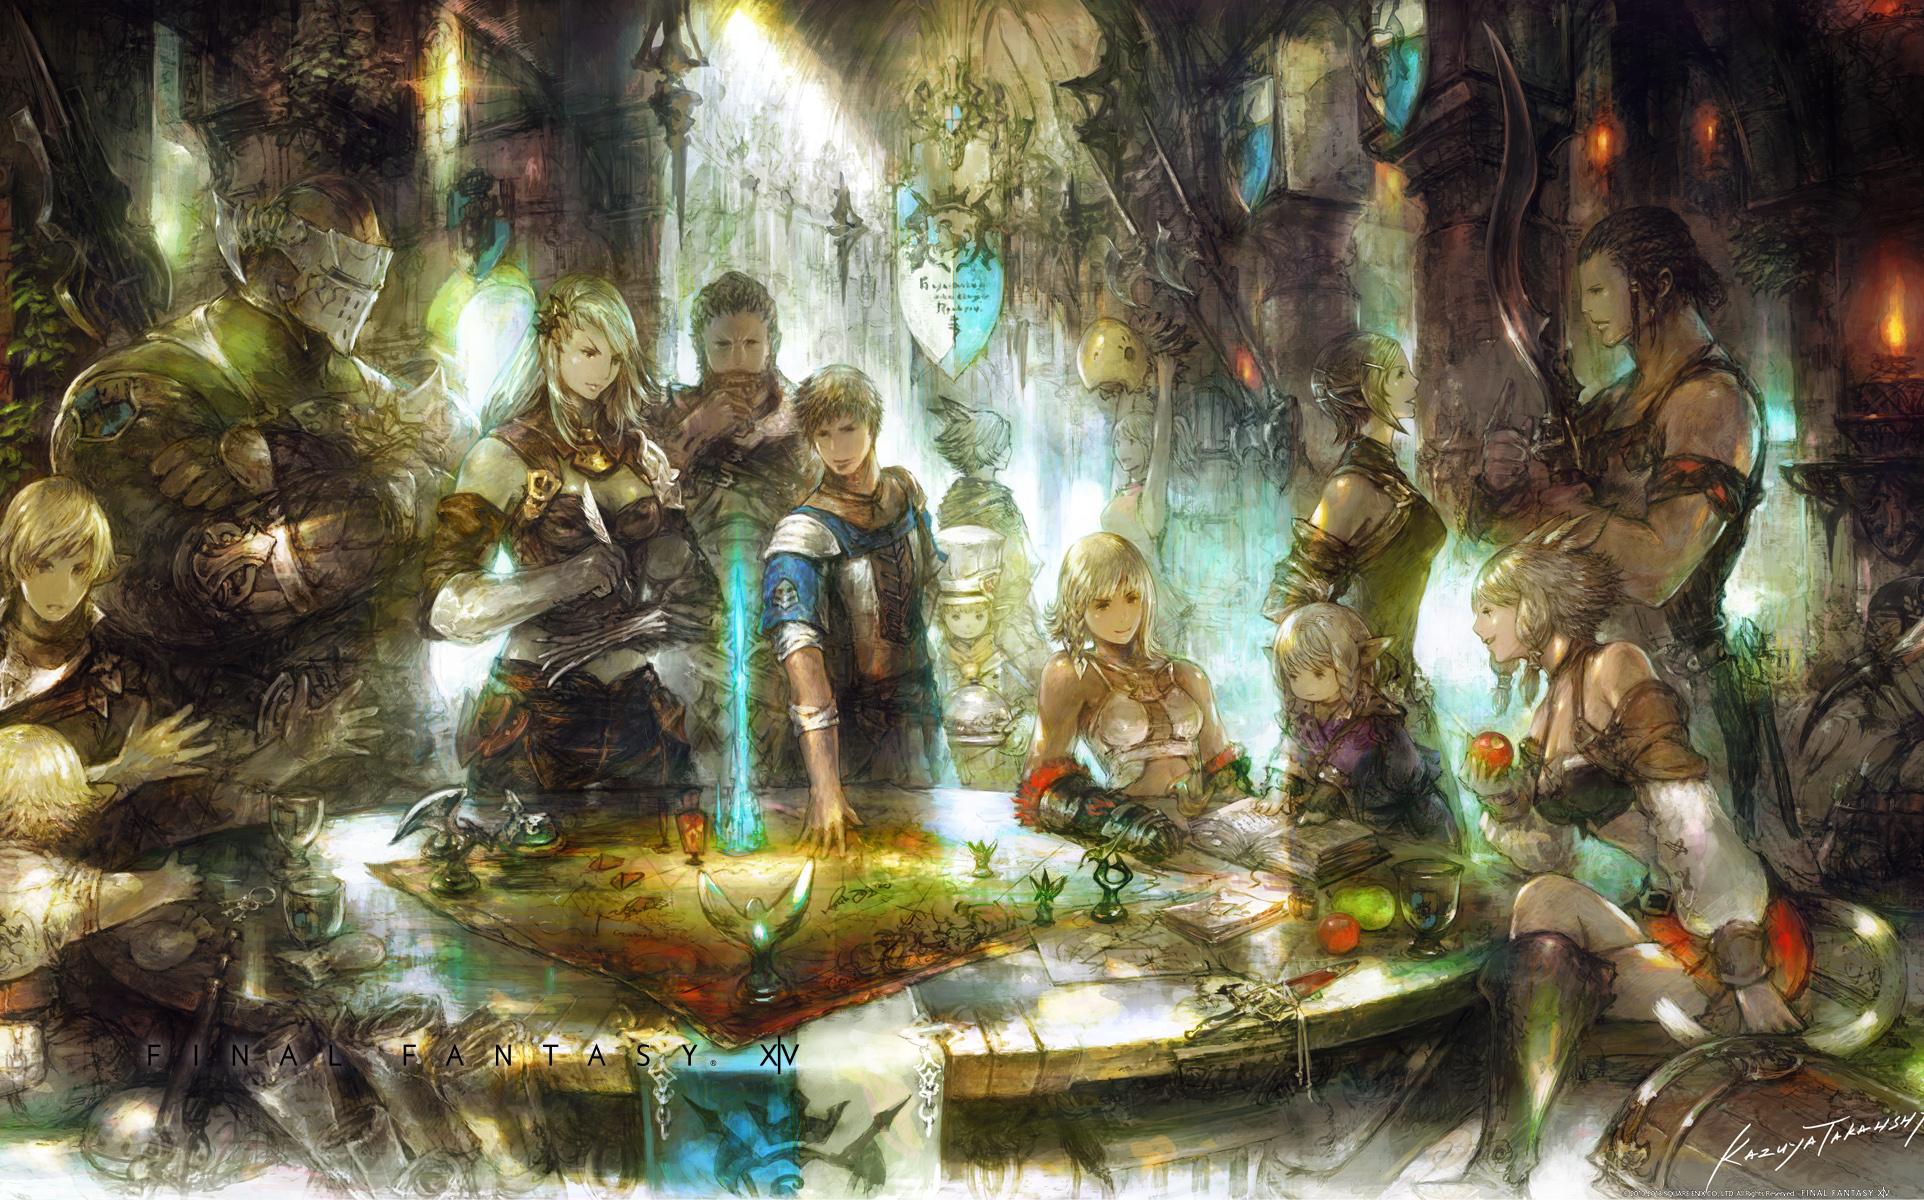 Final Fantasy Xiv A Realm Reborn Fantasy Art Wallpapers: A Realm Reborn Full HD Wallpaper And Background Image